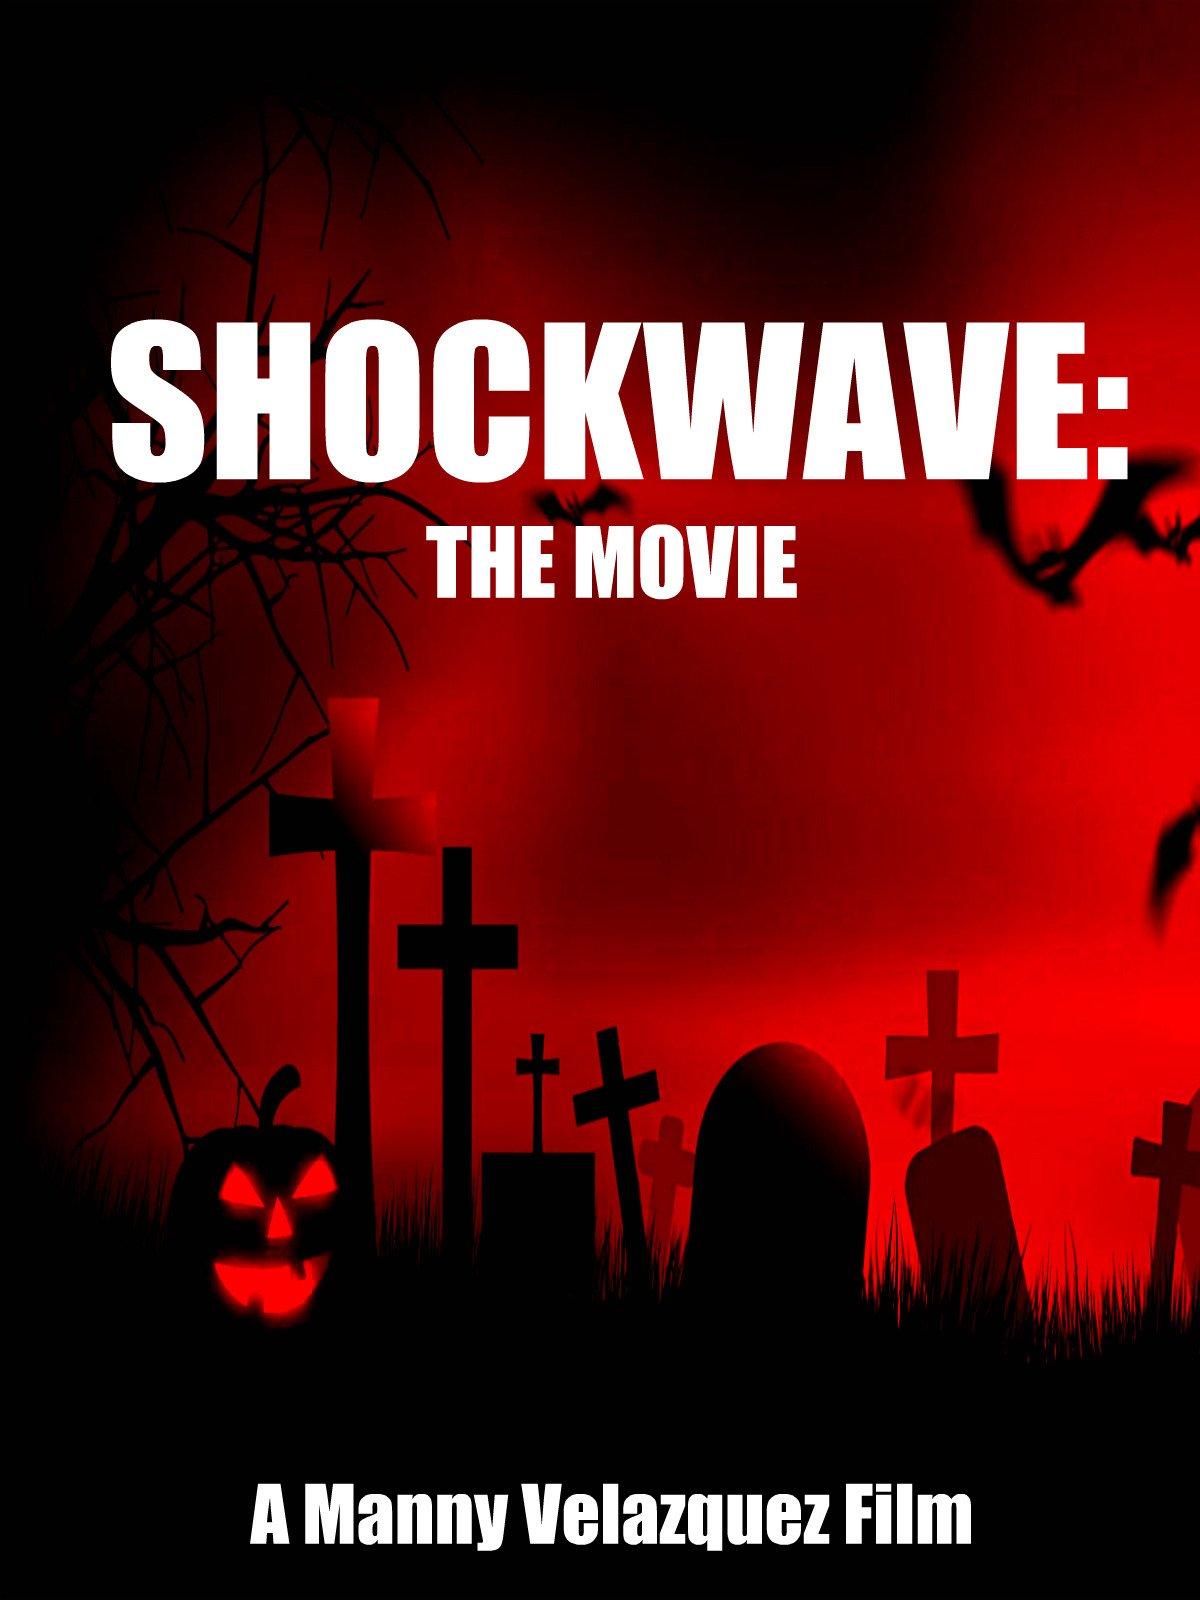 Shockwave: The Movie